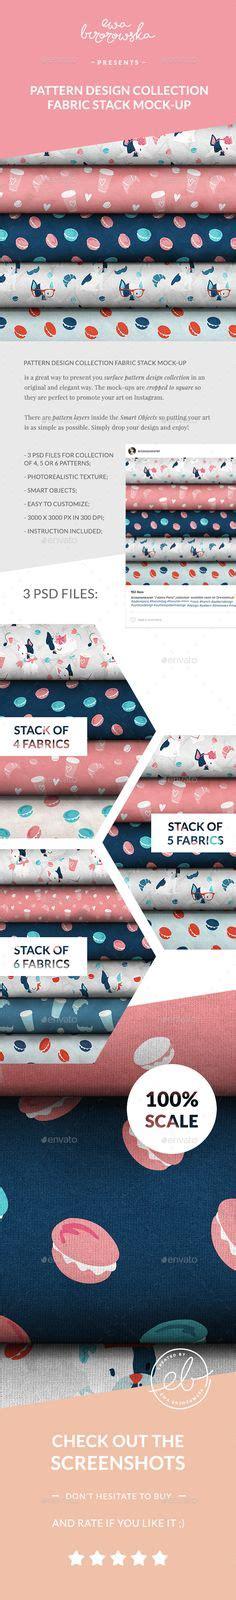 pattern mock up apron mock up miscellaneous apparel mockup templates